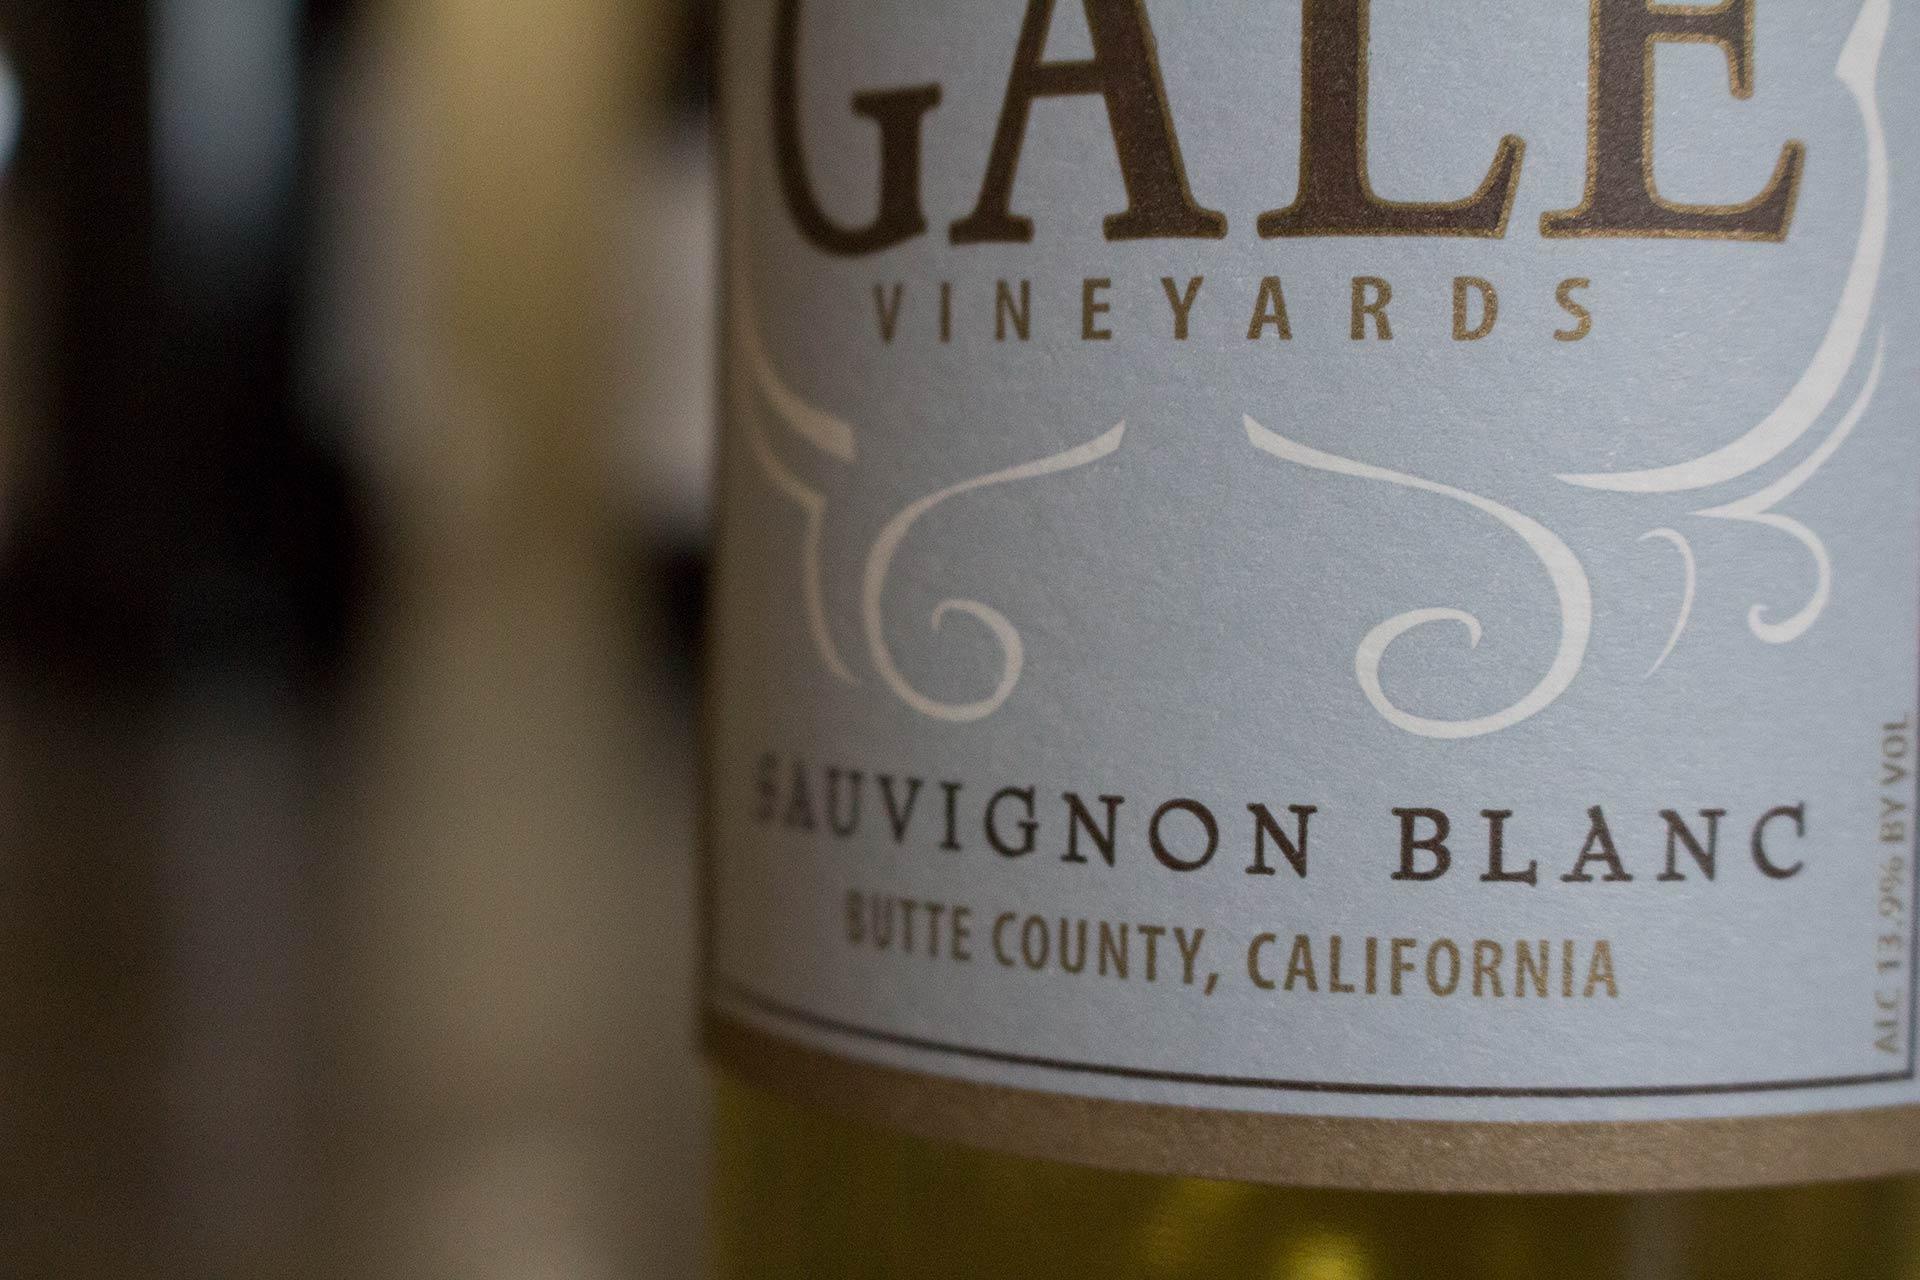 Gale-Vineyards-Sauvignon-Blanc-Wine.jpg